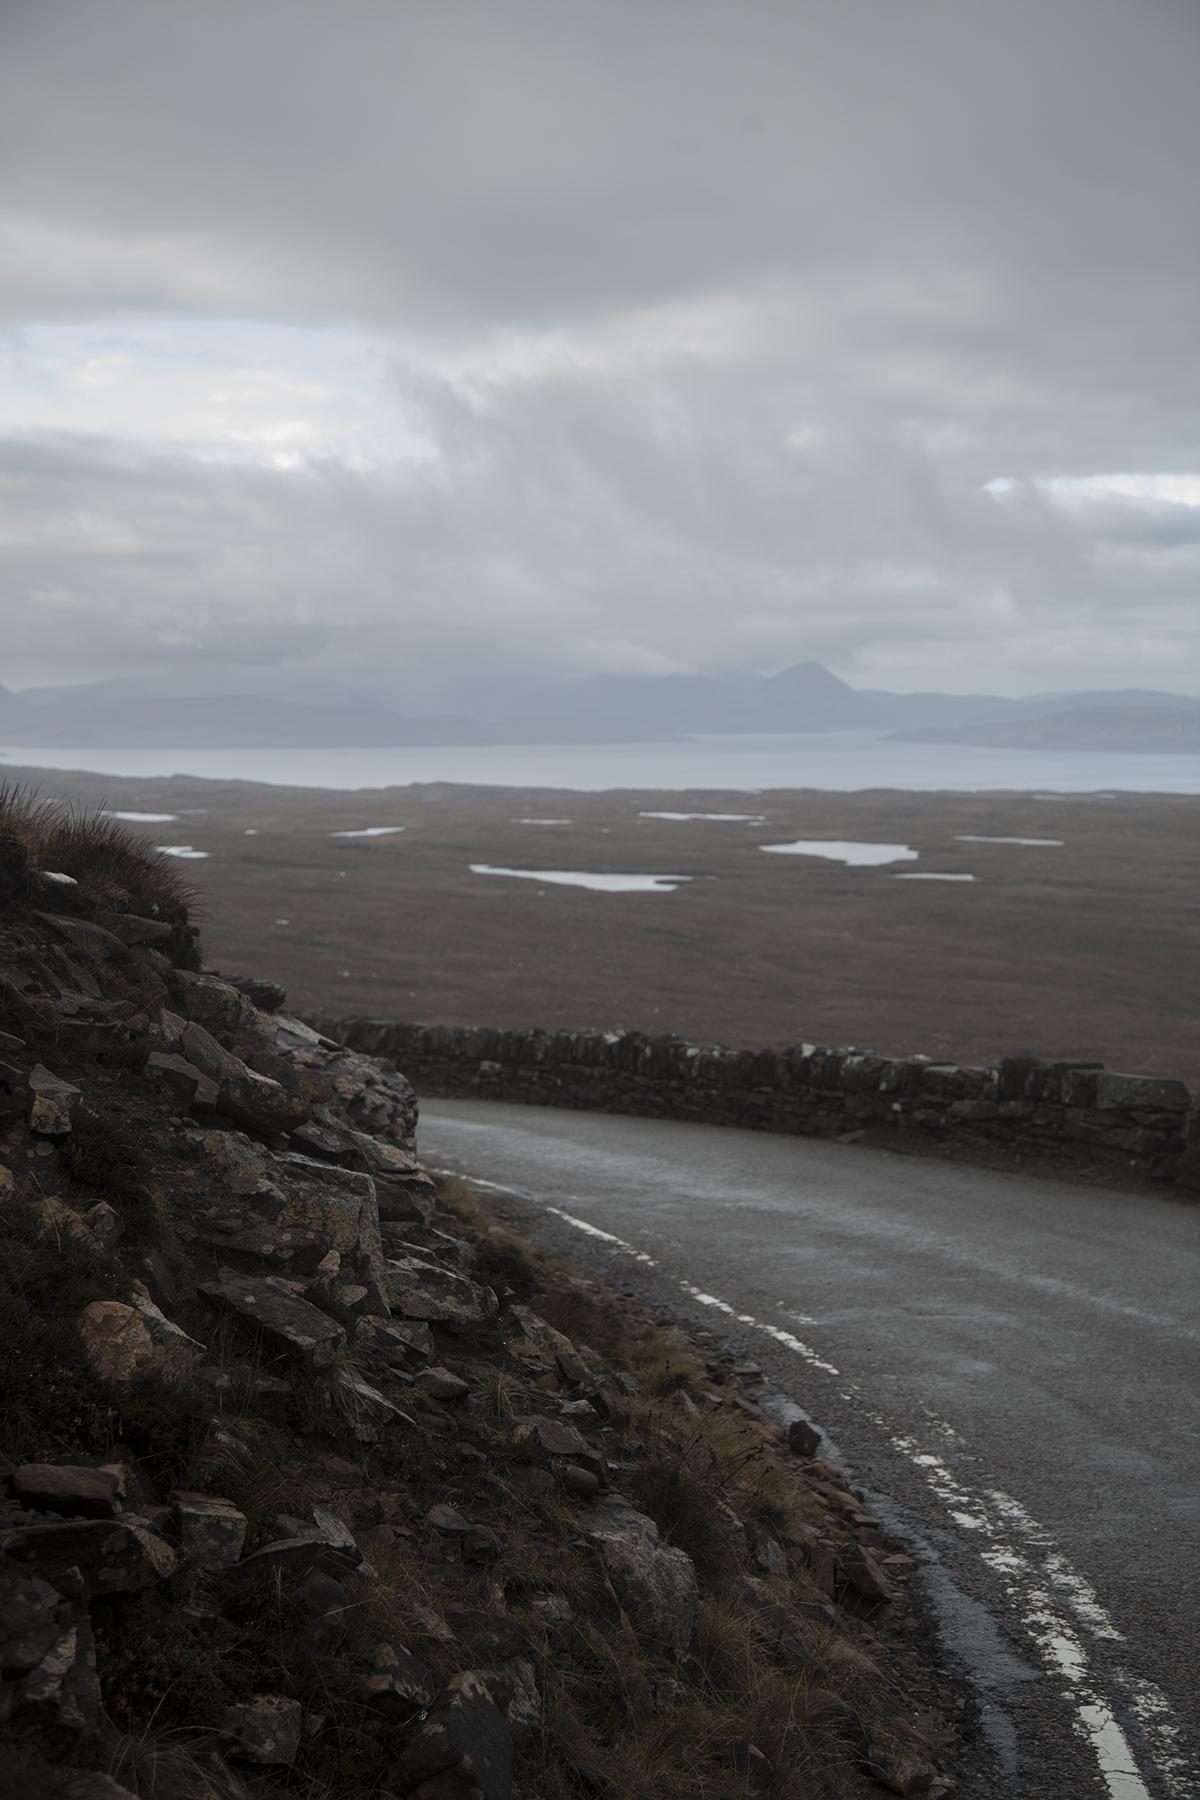 north-coast-500-scotland-29.jpg